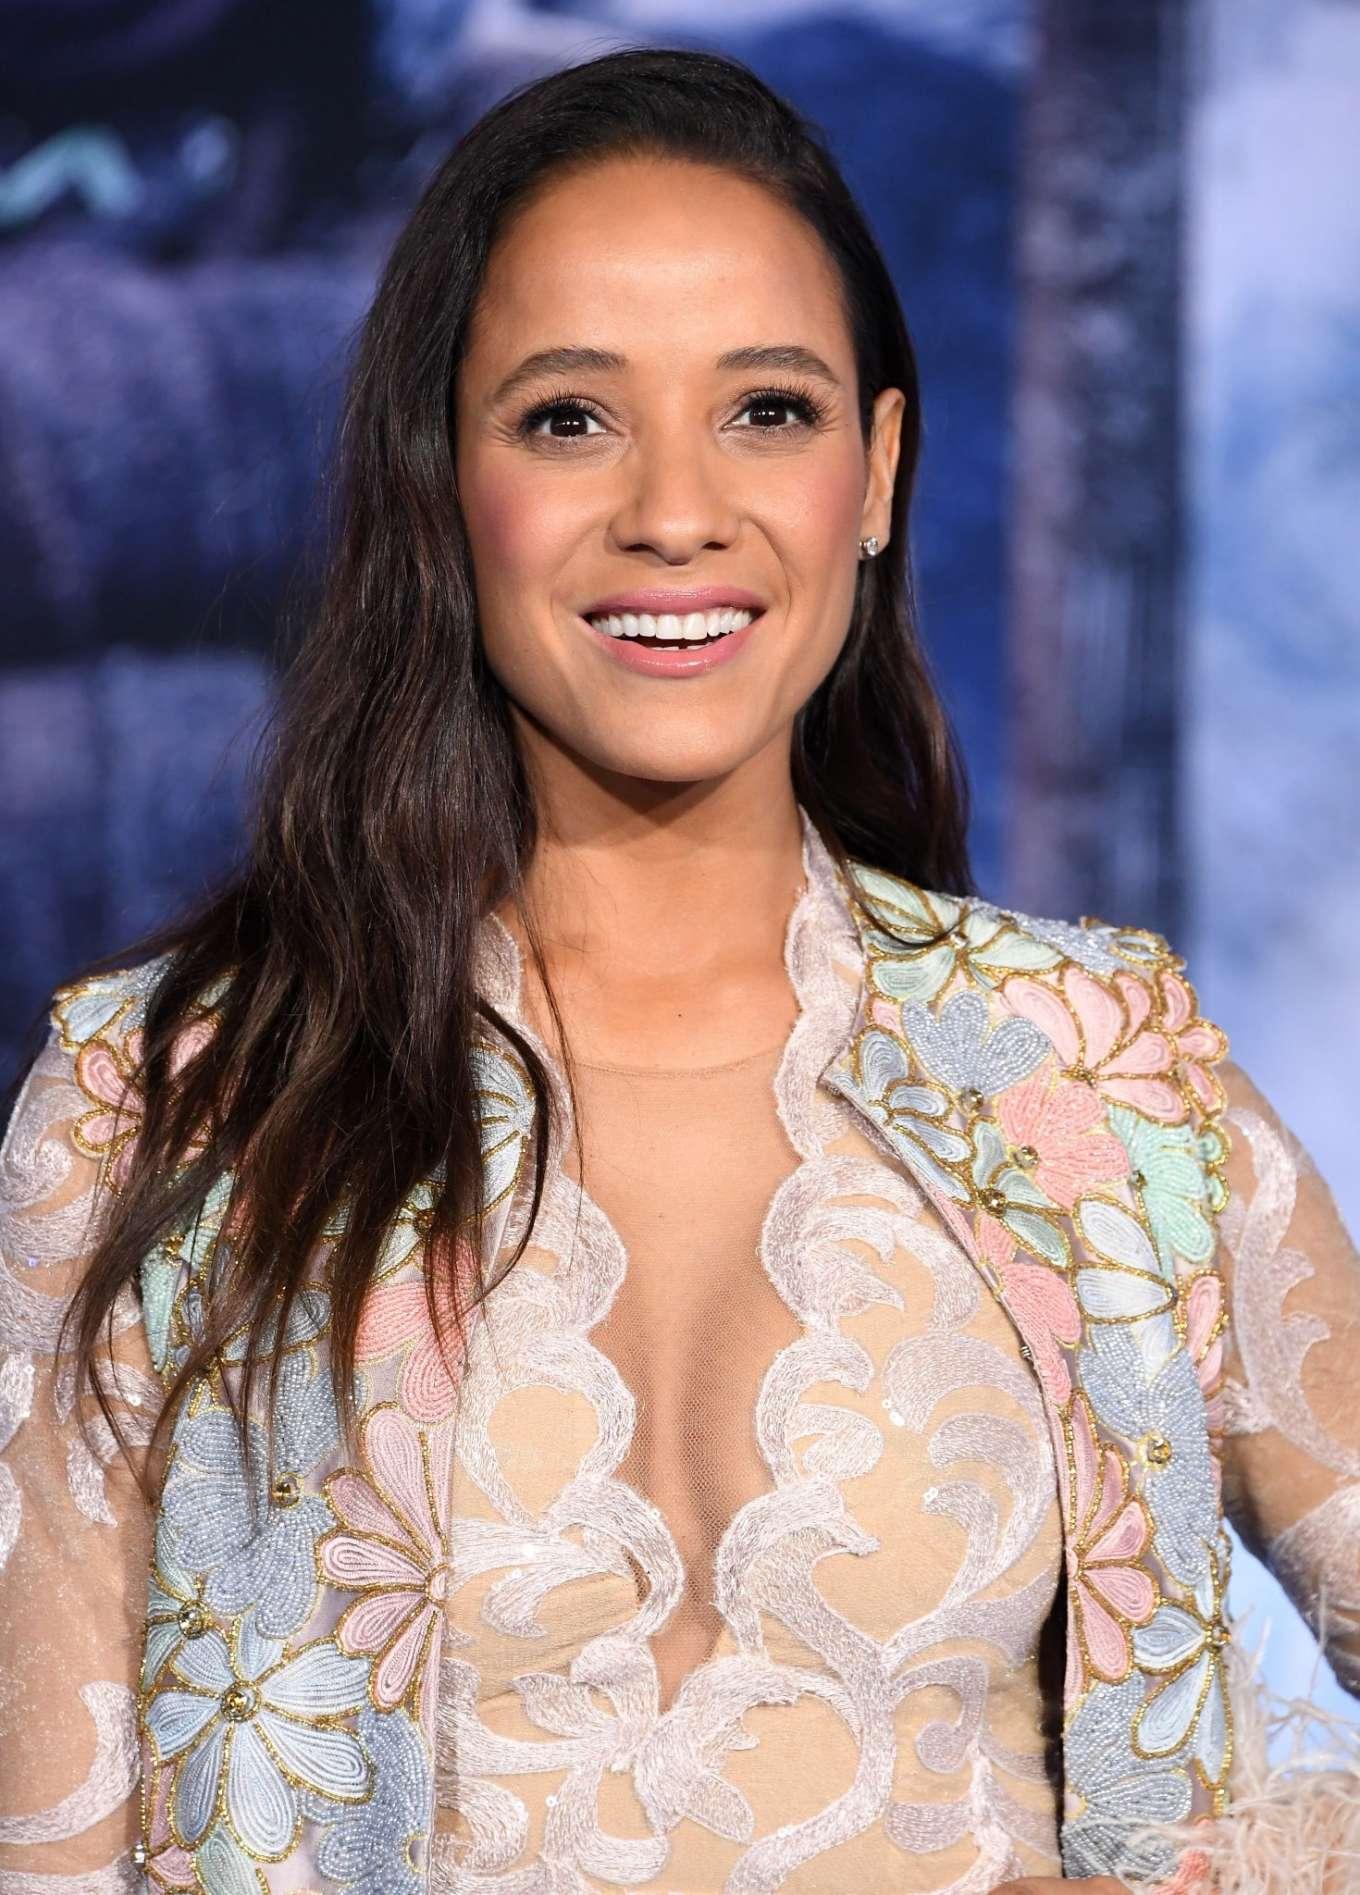 Dania Ramirez 2019 : Dania Ramirez – Jumanji: The Next Level premiere in Hollywood-18